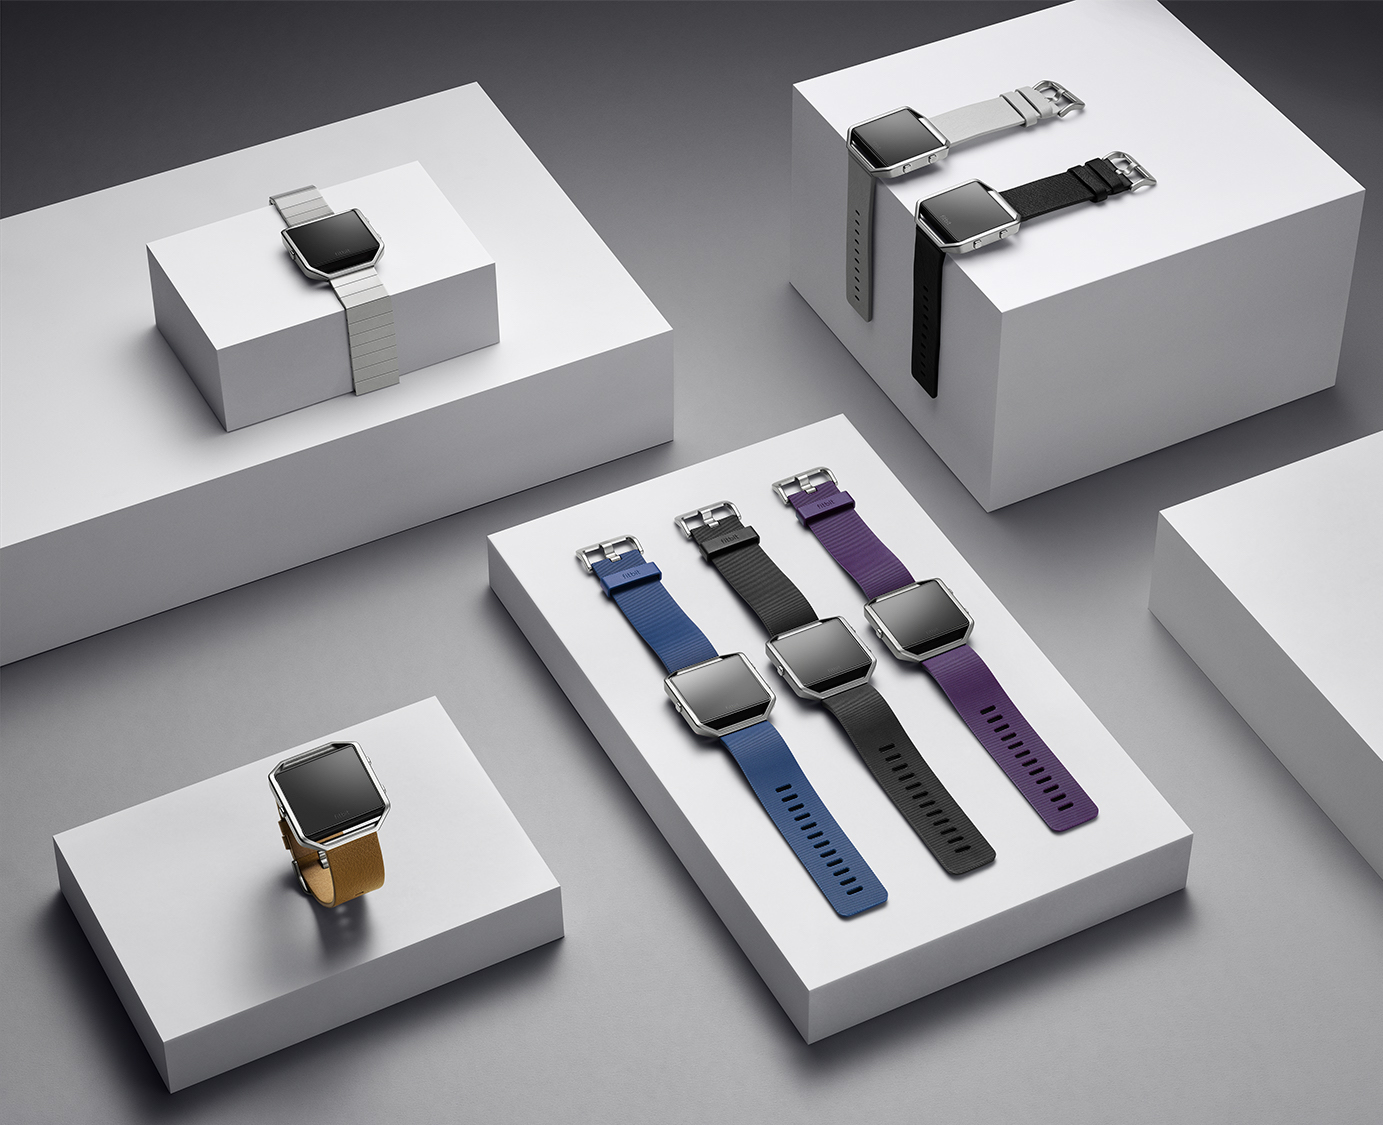 Fitbit-Blaze_Lineup-2-2